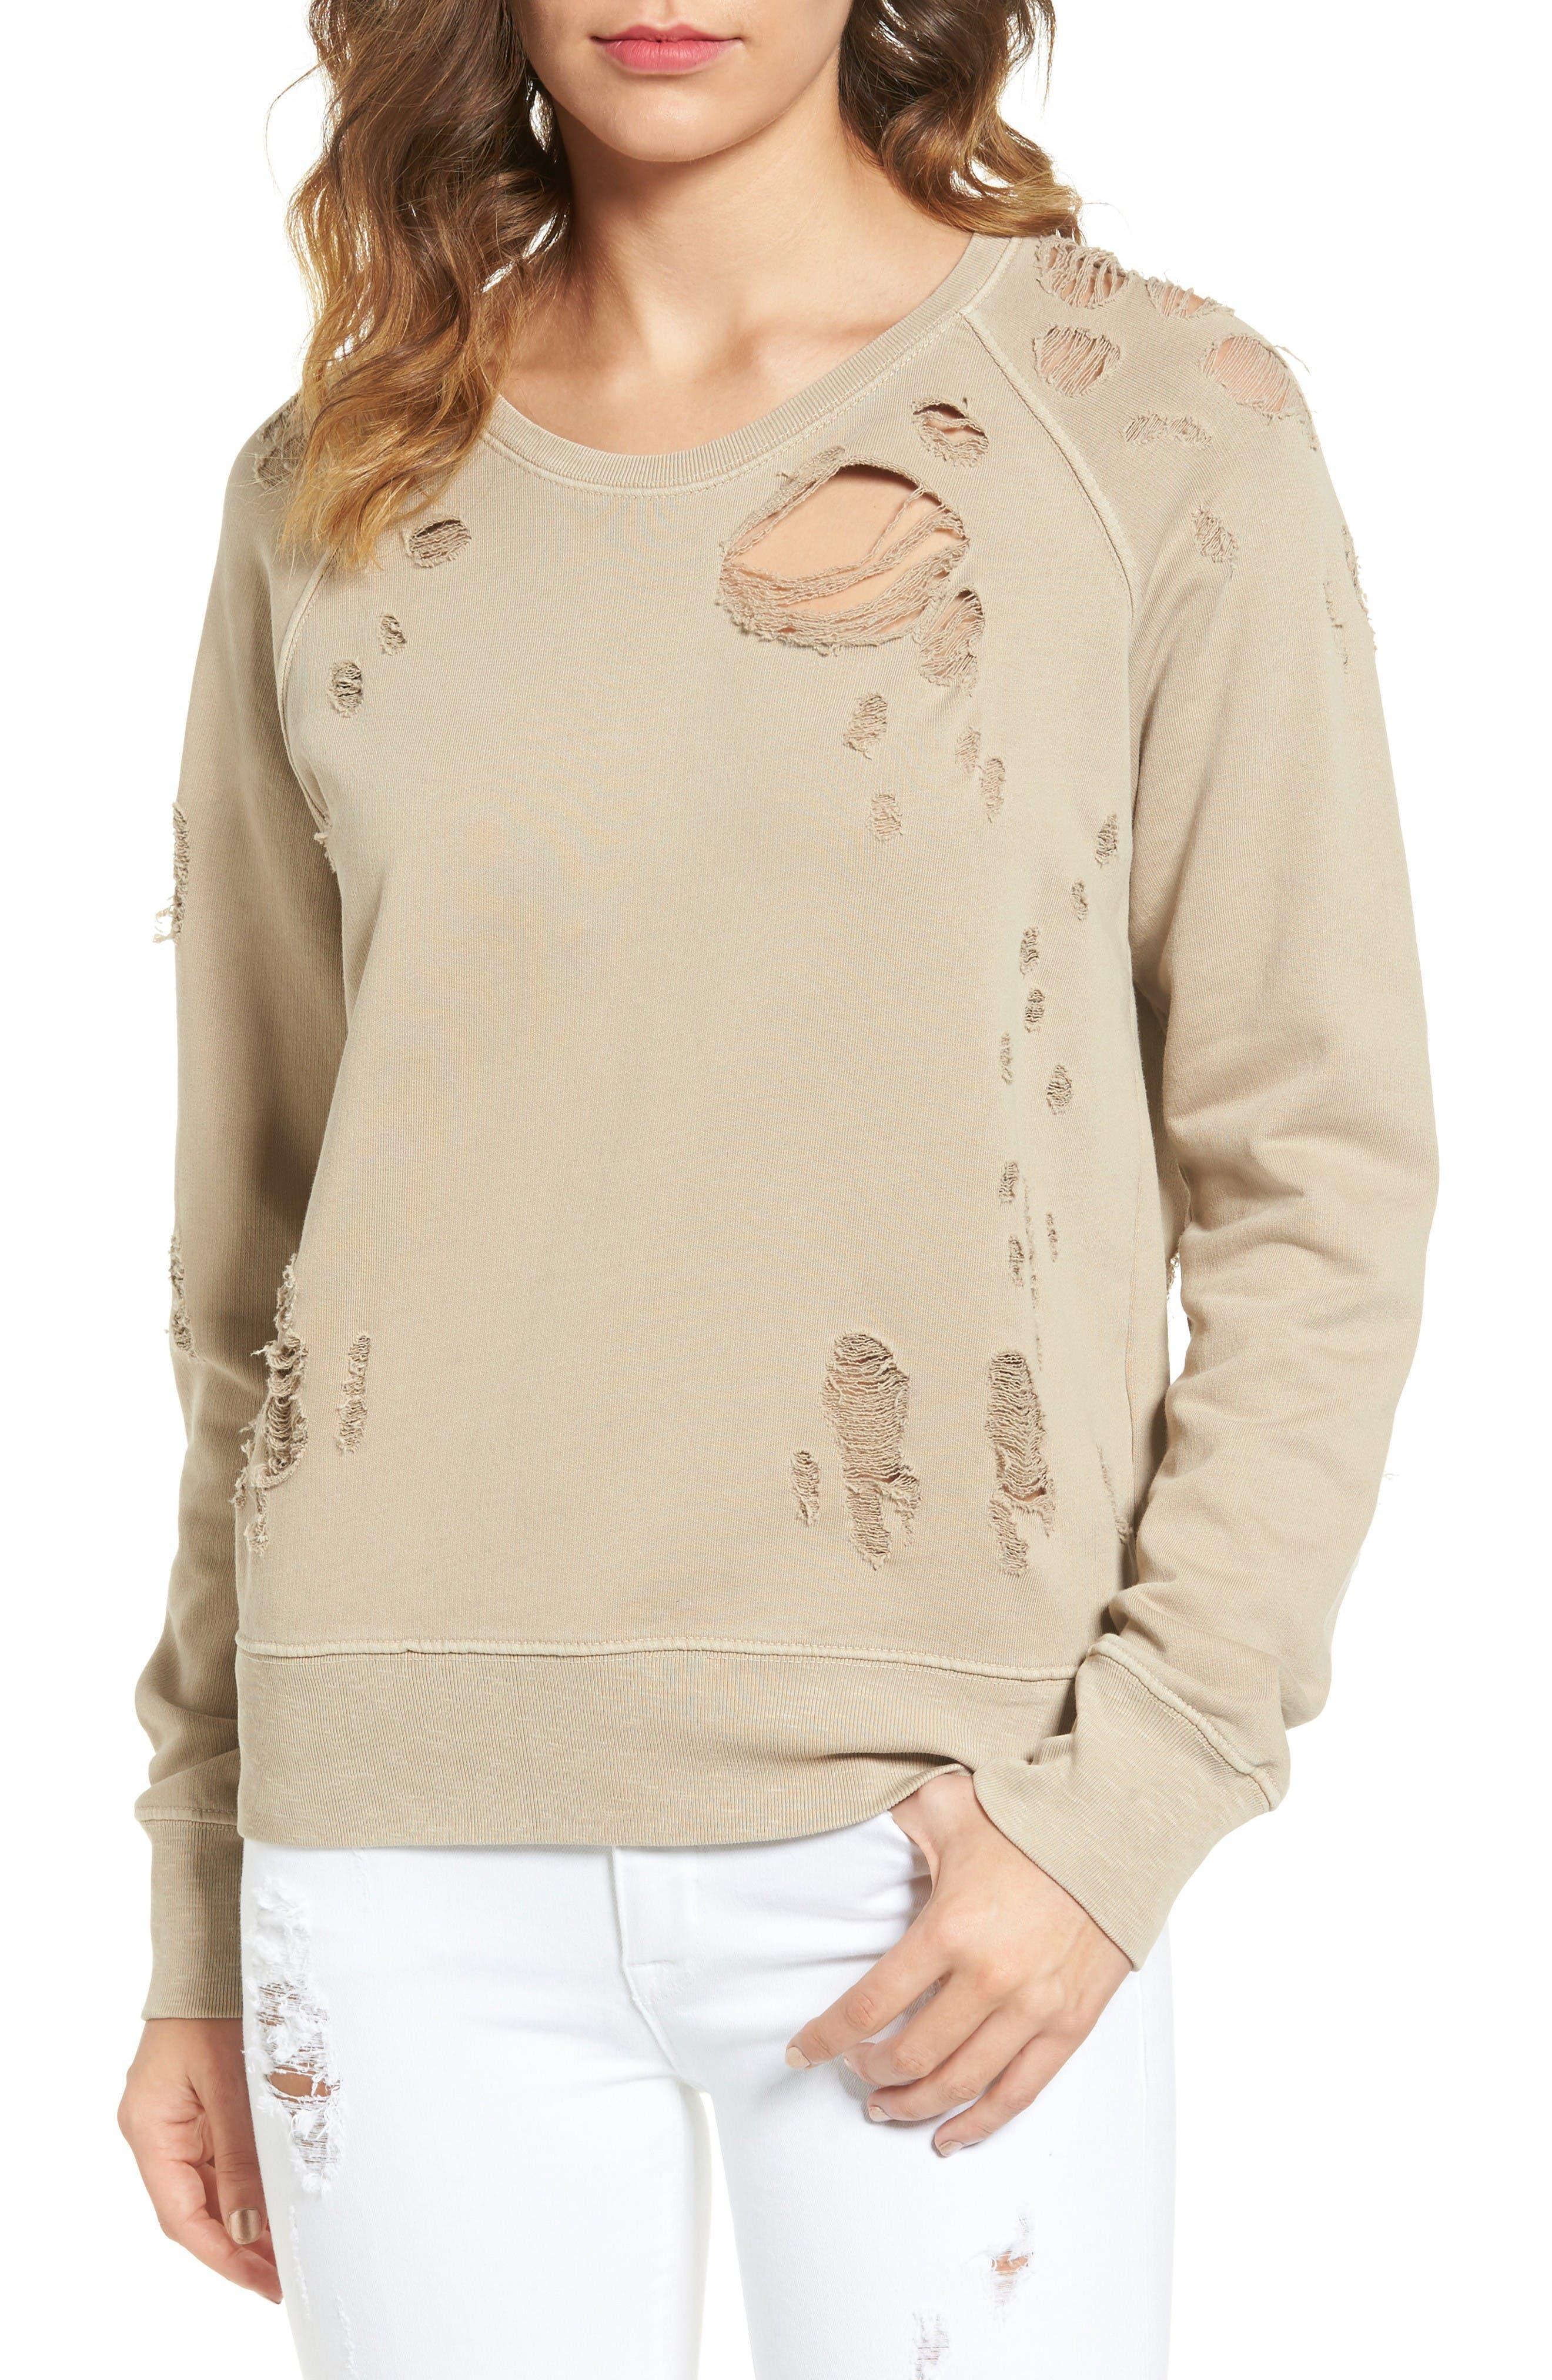 Sincerely Jules Destroyed Cotton Sweatshirt